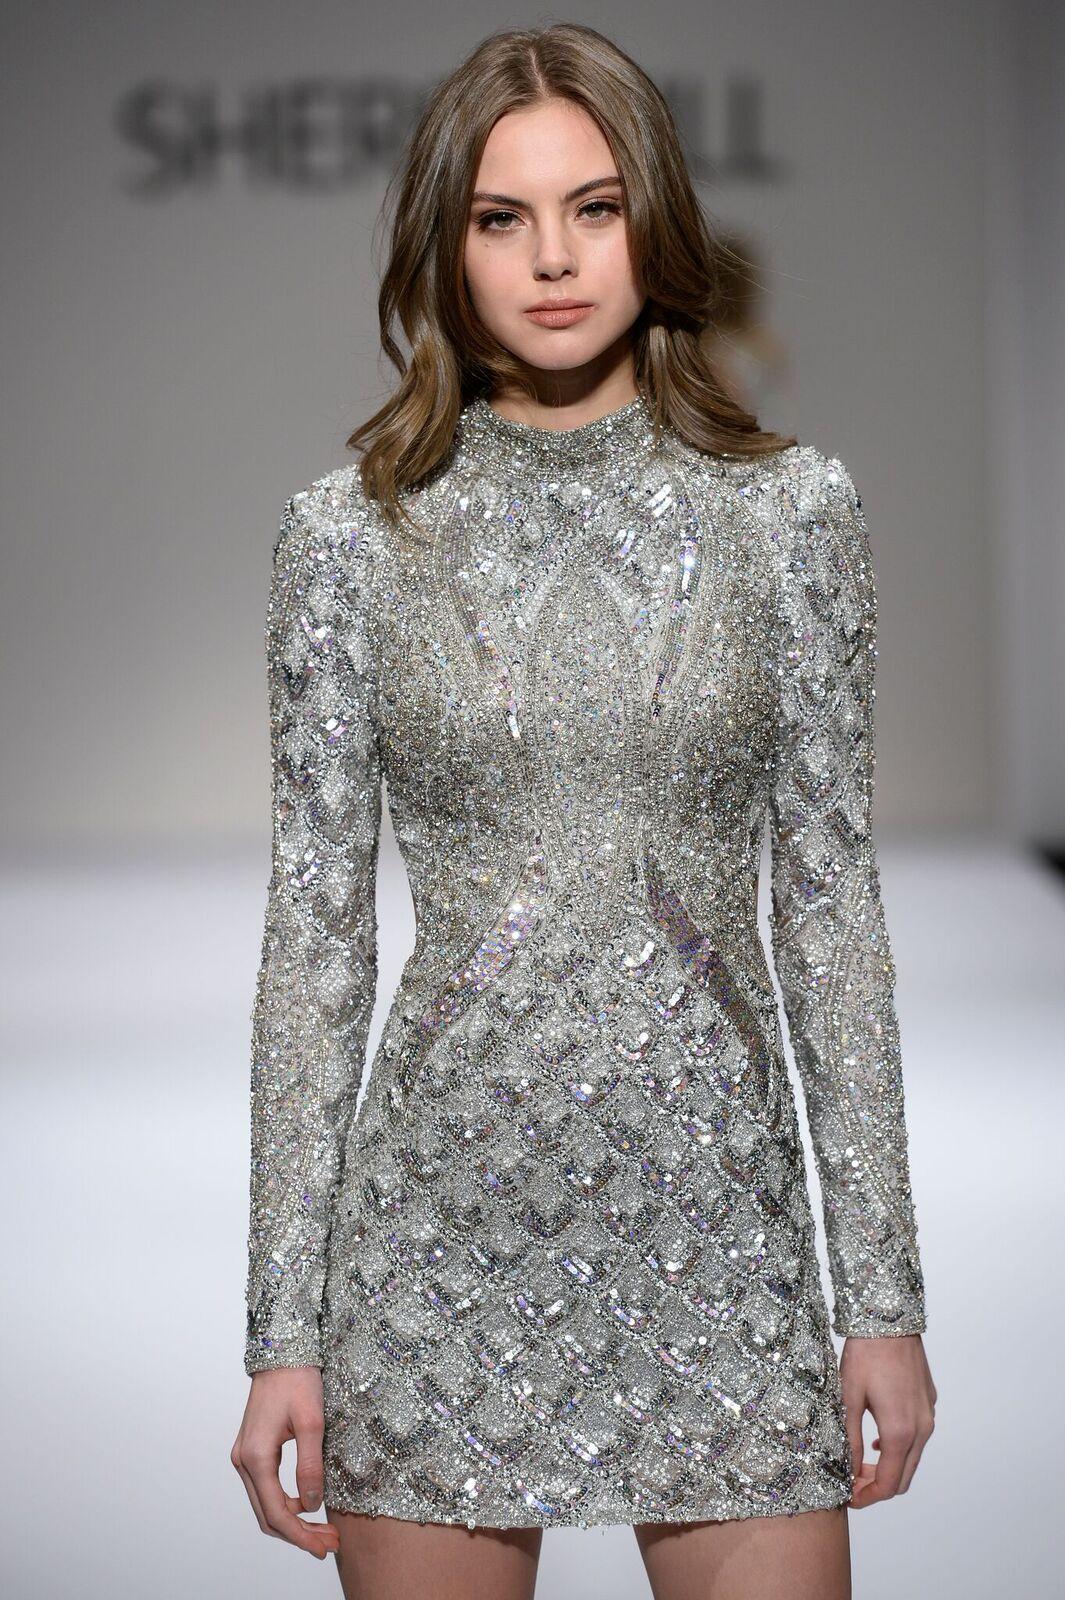 5f3510233543 Sherri Hill Silver Longsleeve High Neckline Fully Beaded Ypsilon Dresses  Prom Pageant Evening Wear School Dance